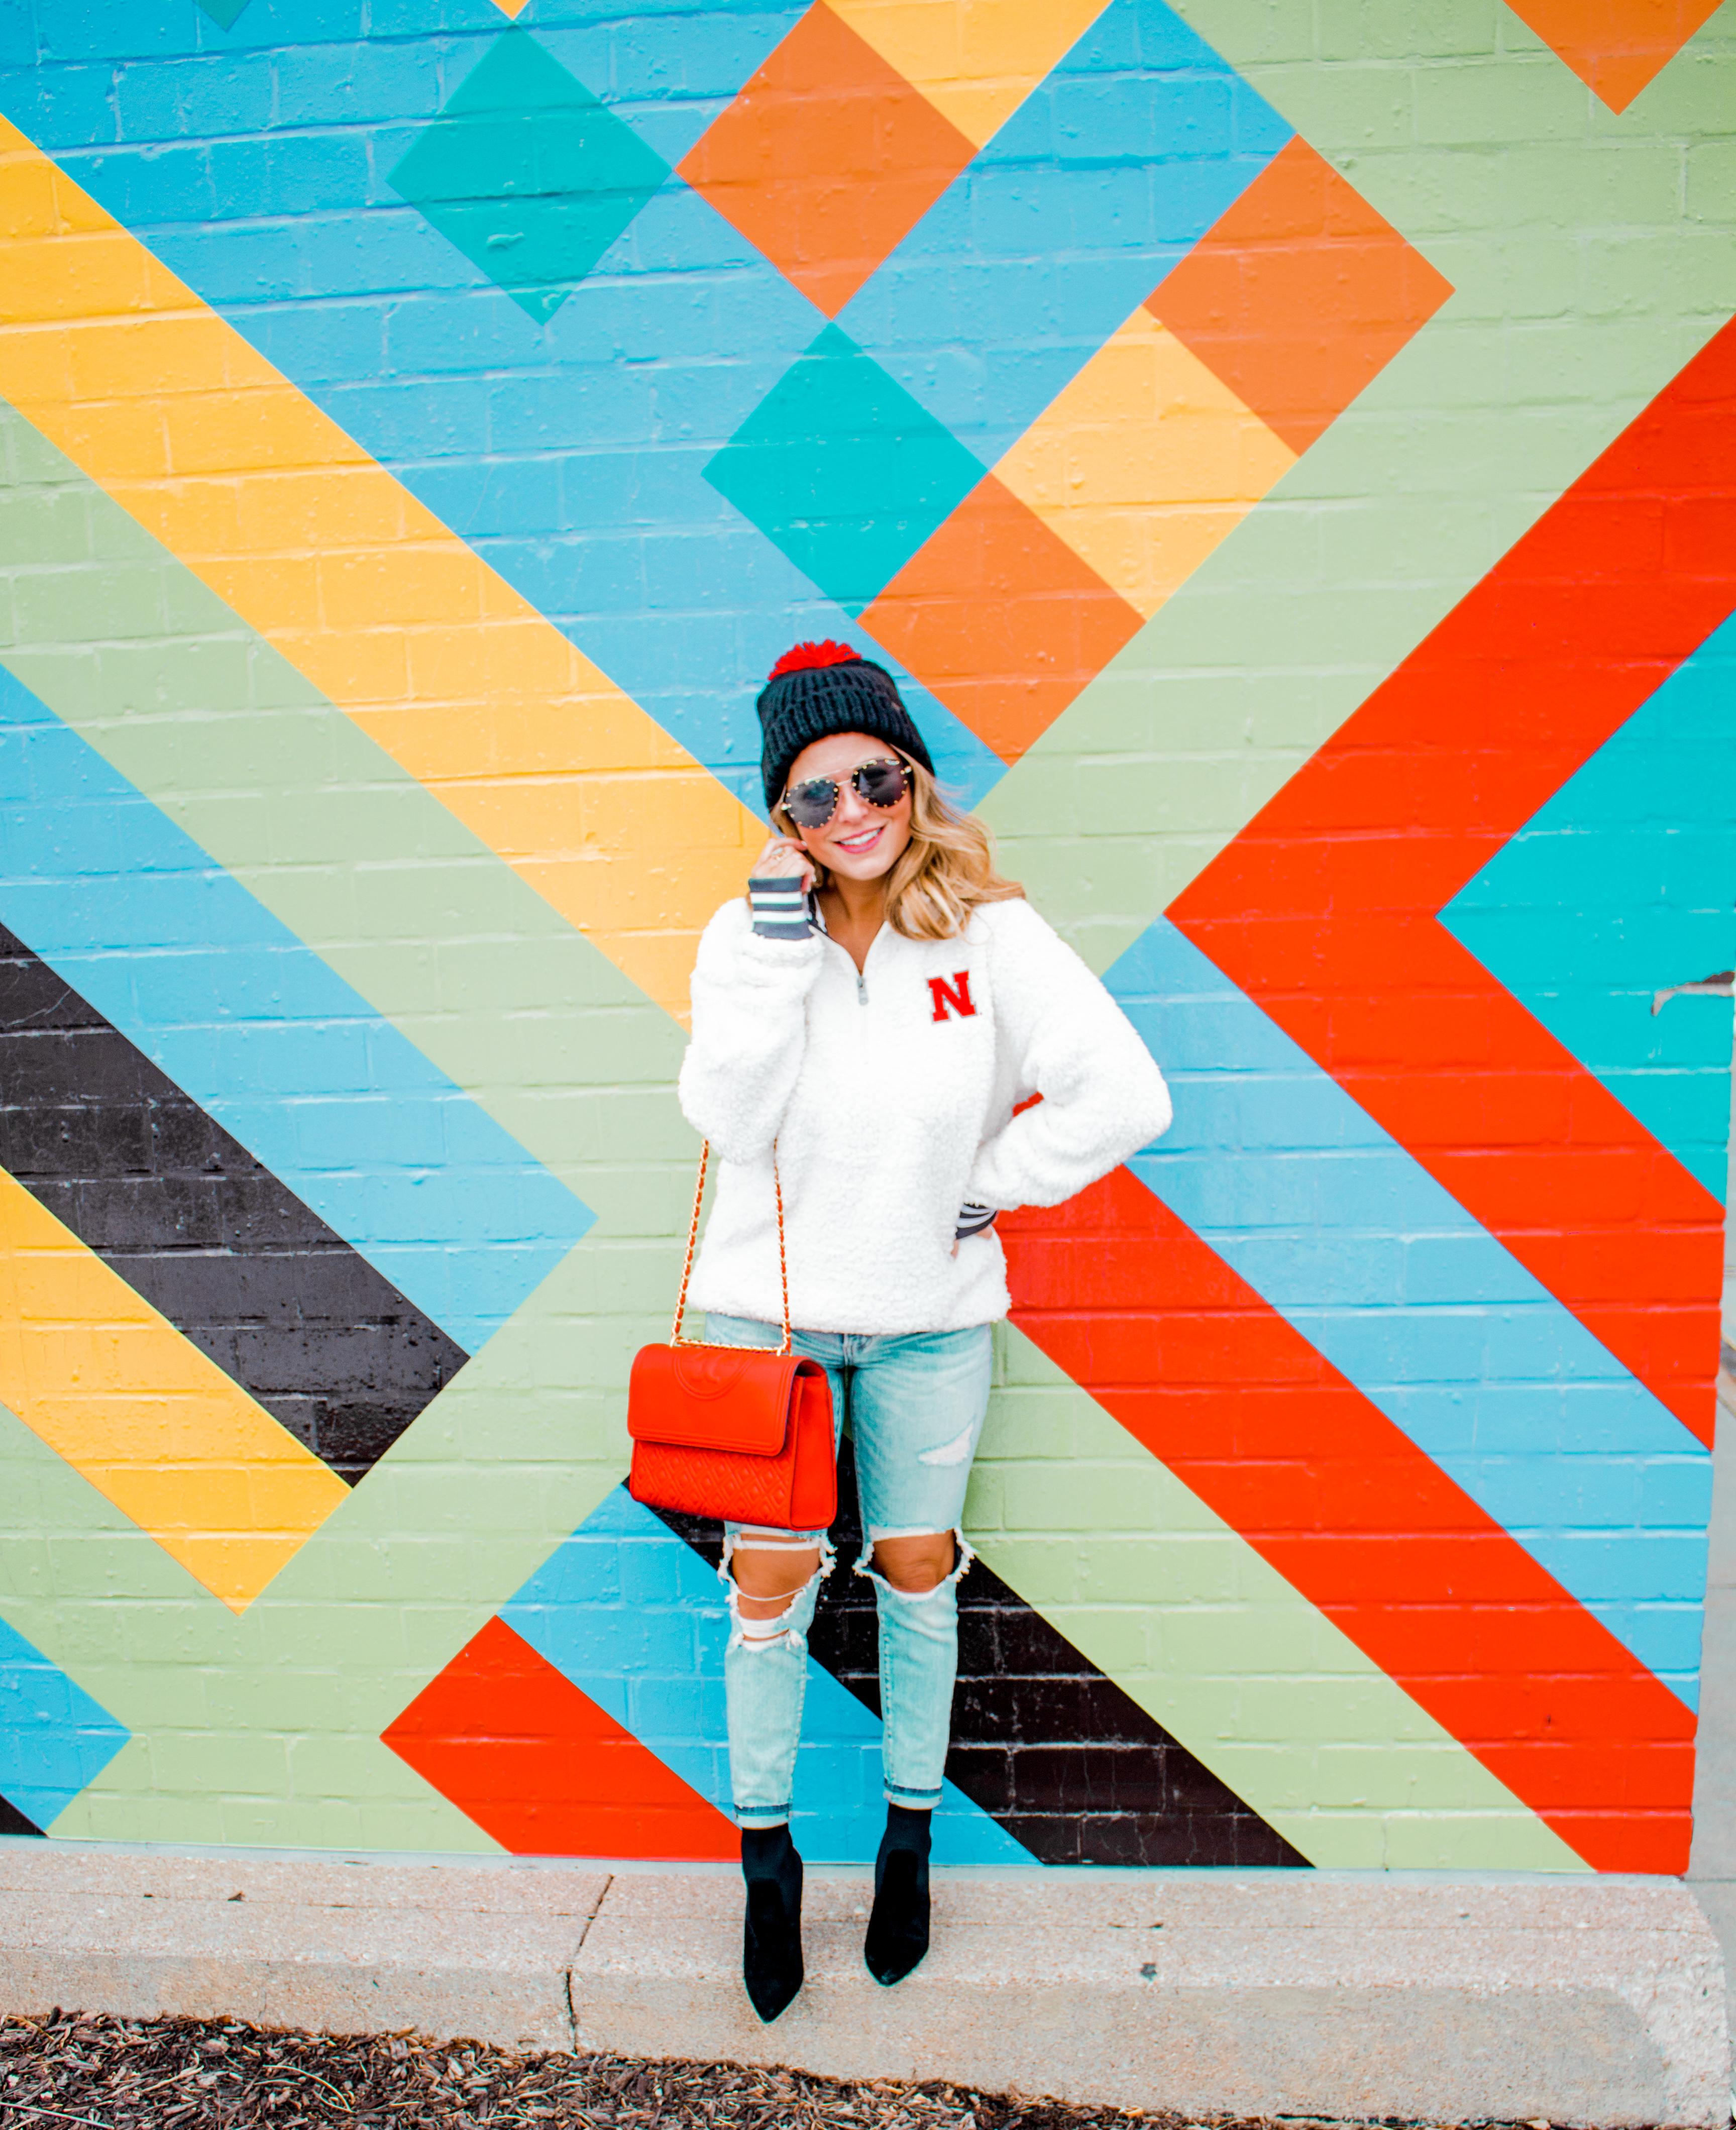 Nebraska - Women's Fashion - Sherpa - Husker - Pullover - Husker Gear - Omaha Blogger - Sabby Style - Casual Outfit - 7